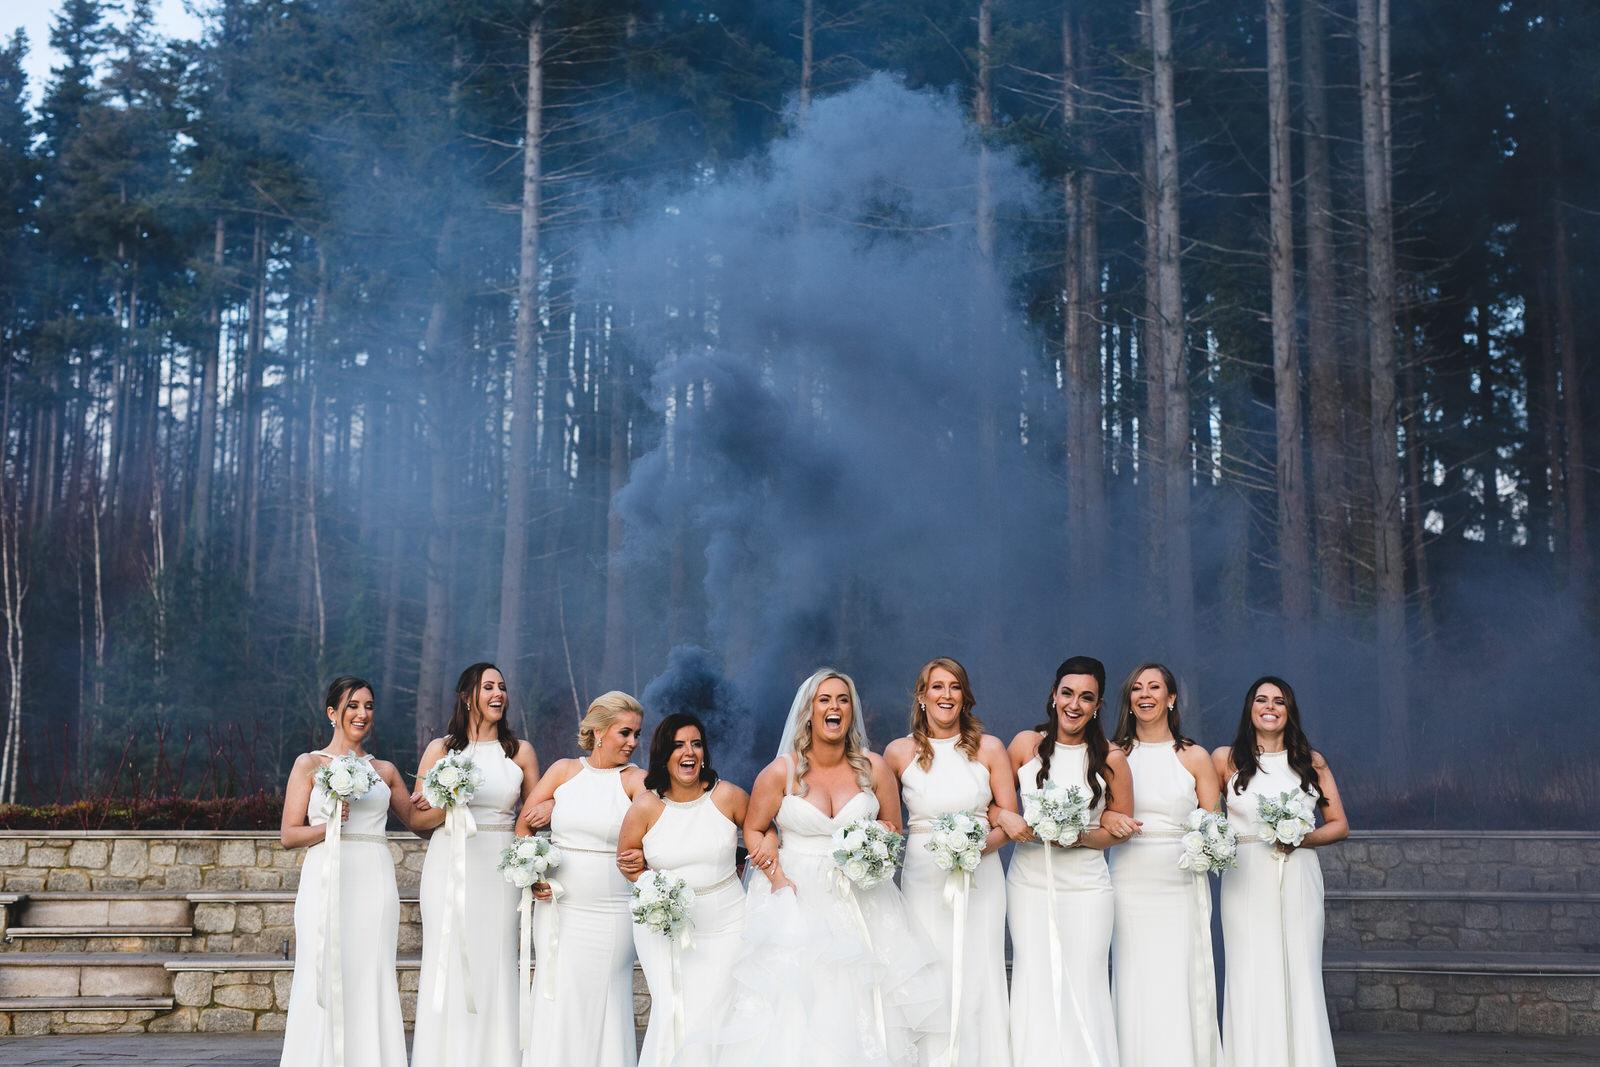 Smokebomb wedding photos at Powerscourt Hotel Wicklow